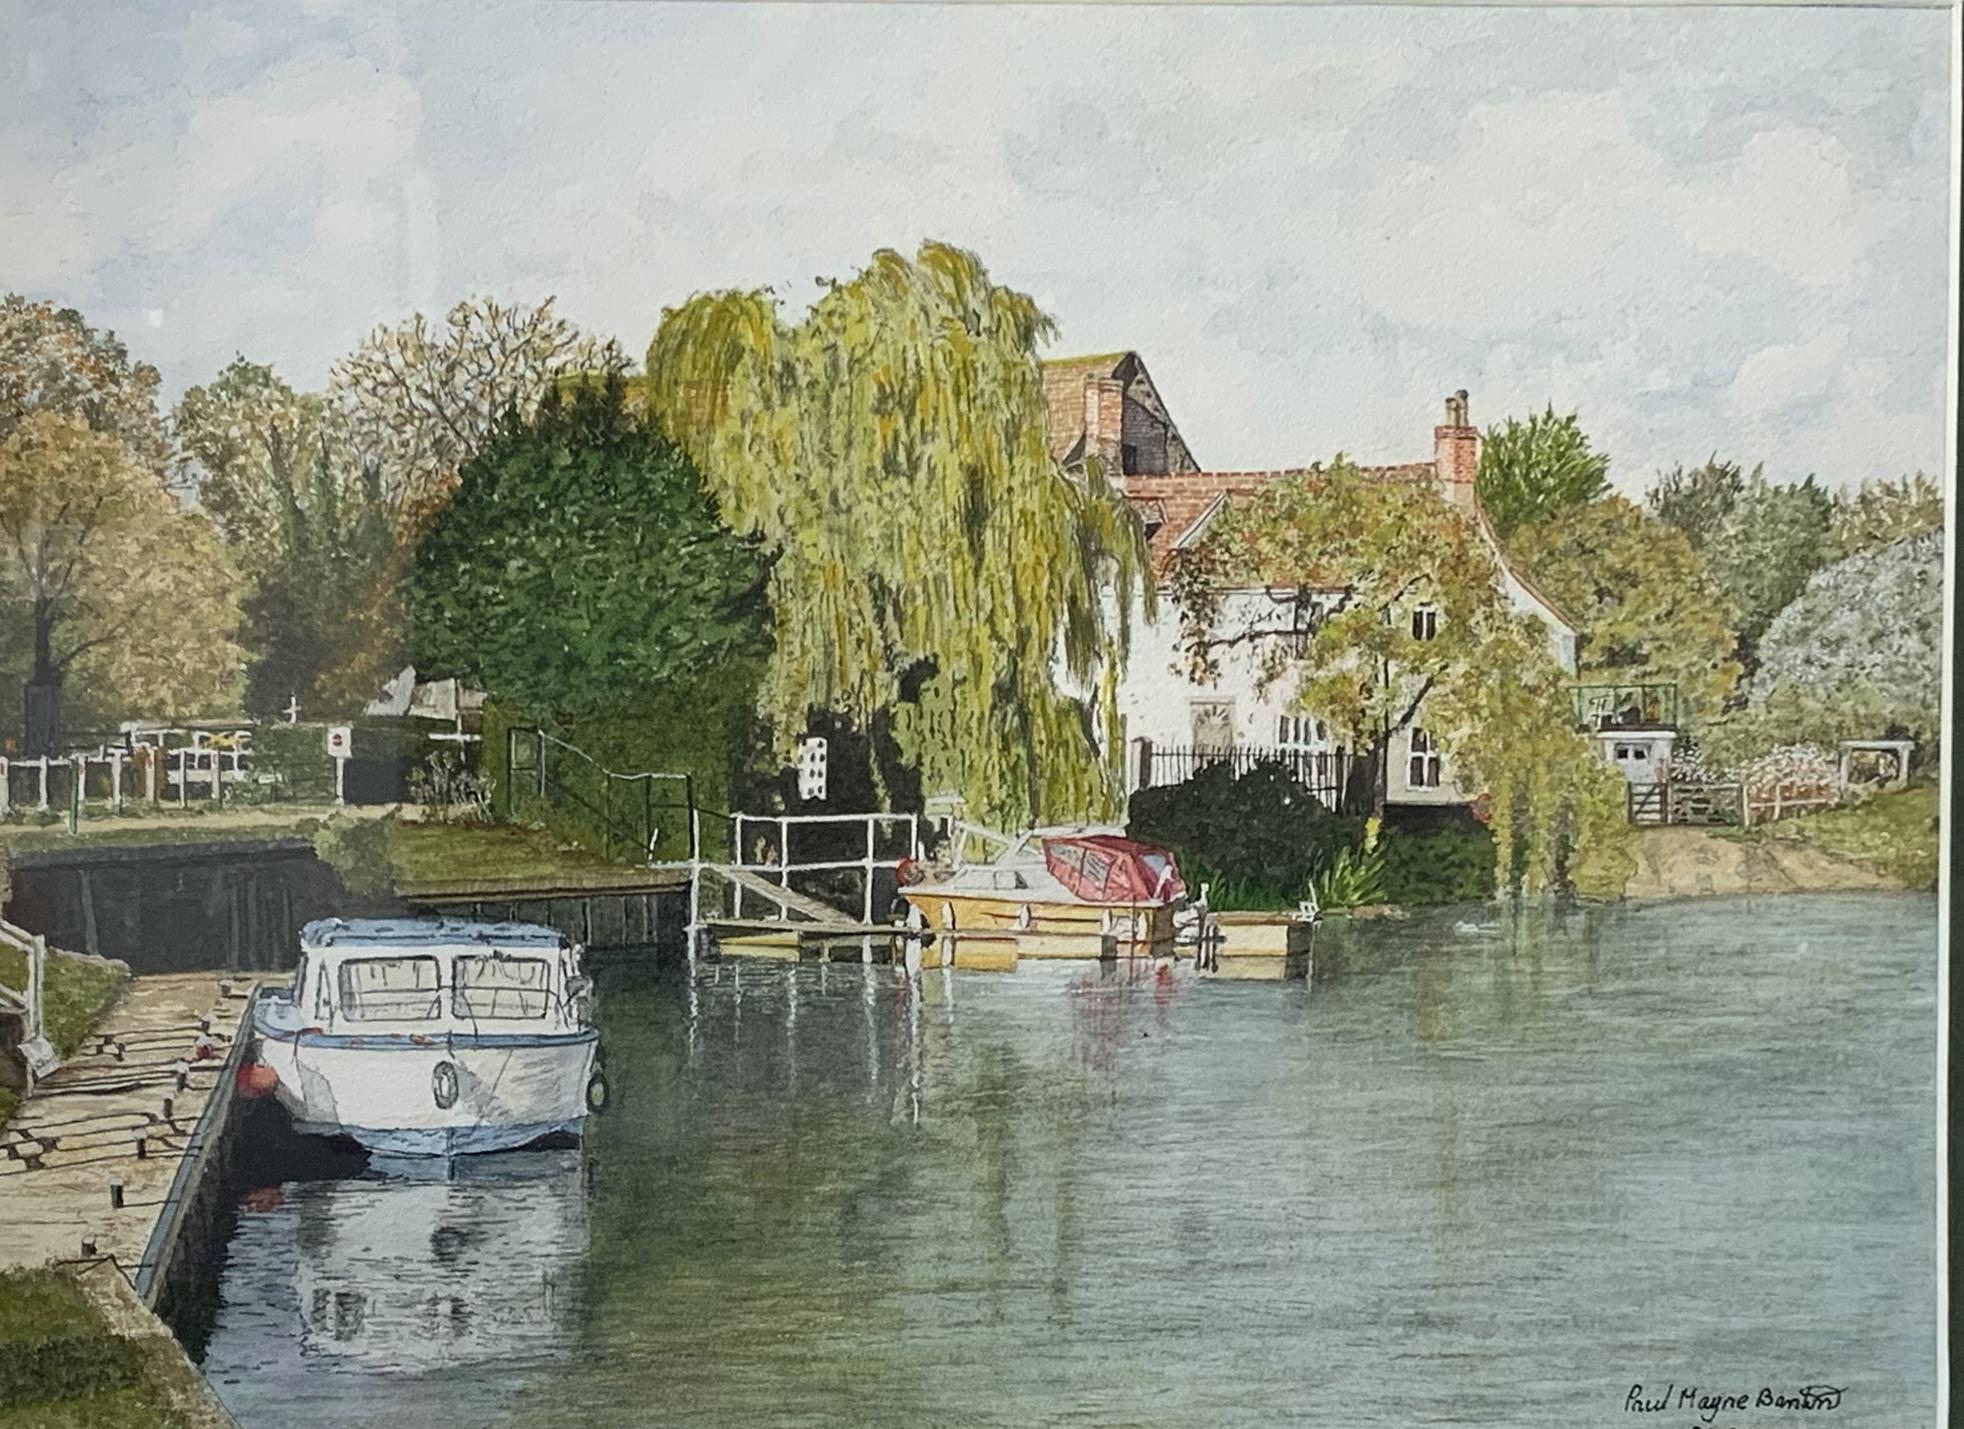 Paul Mayne Banton - Boats at Eaton Lock.